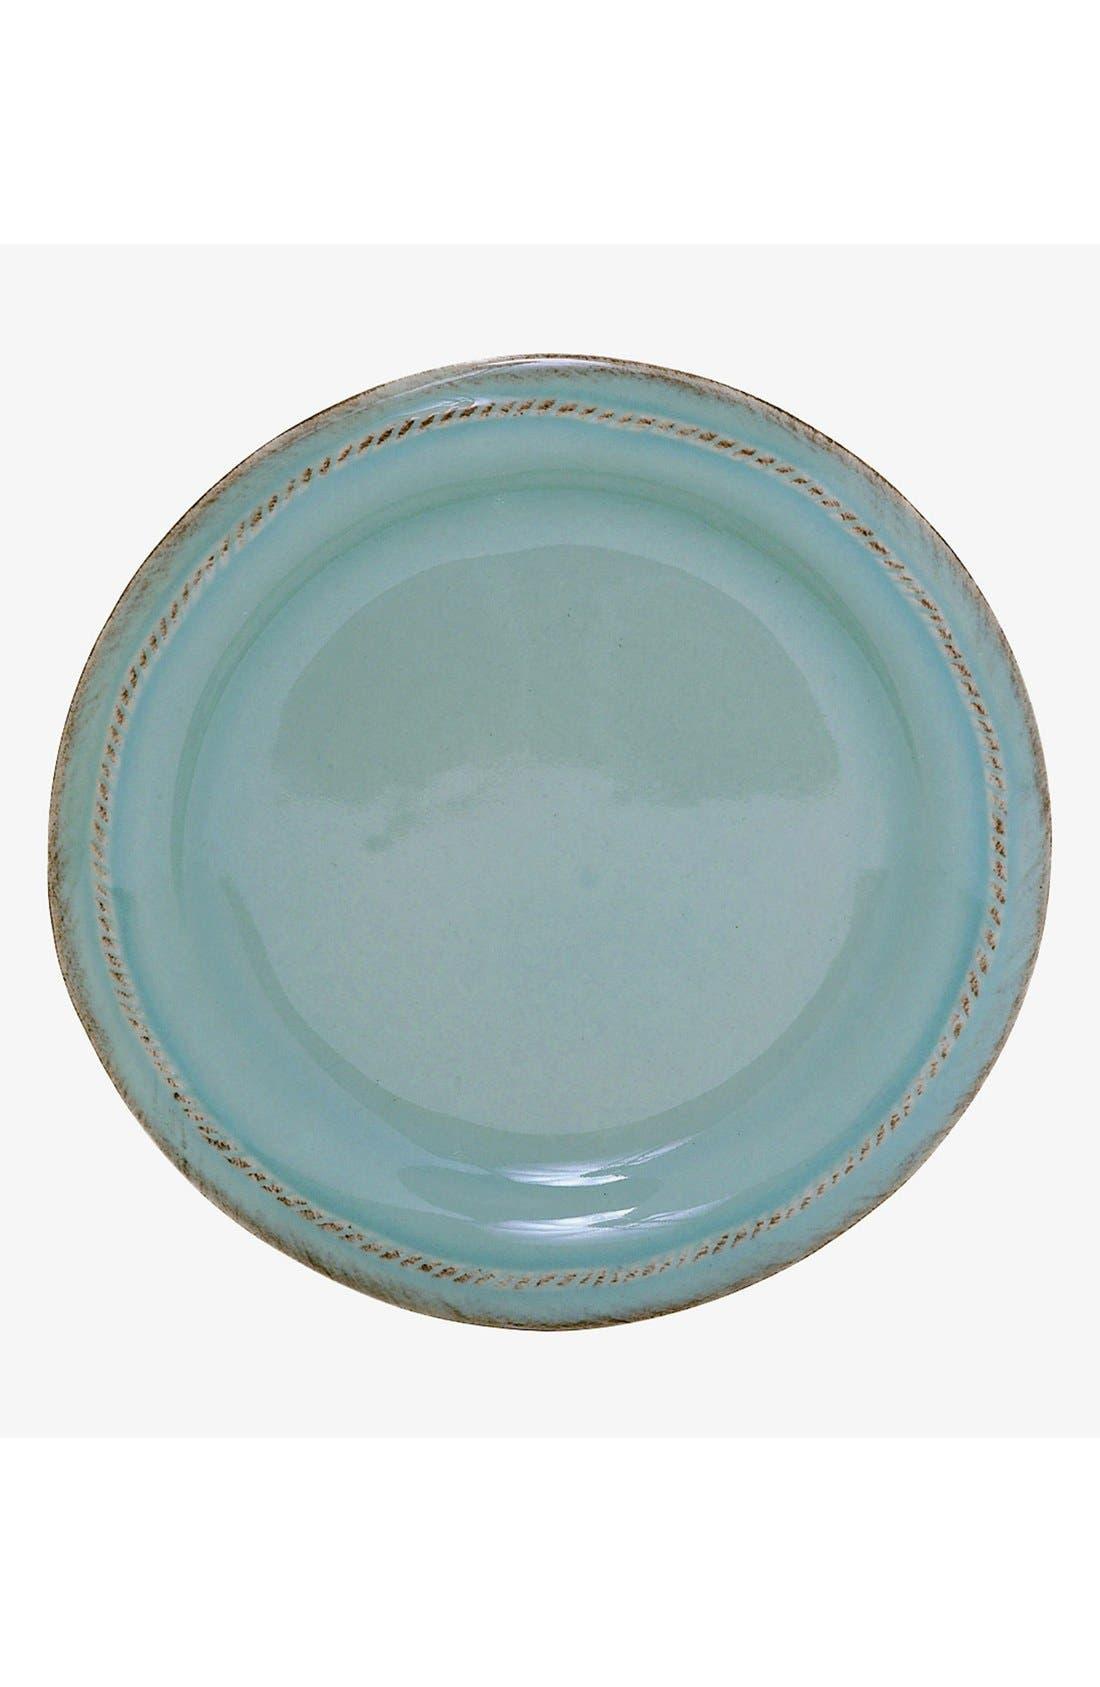 JULISKA 'Berry and Thread' Side Plate